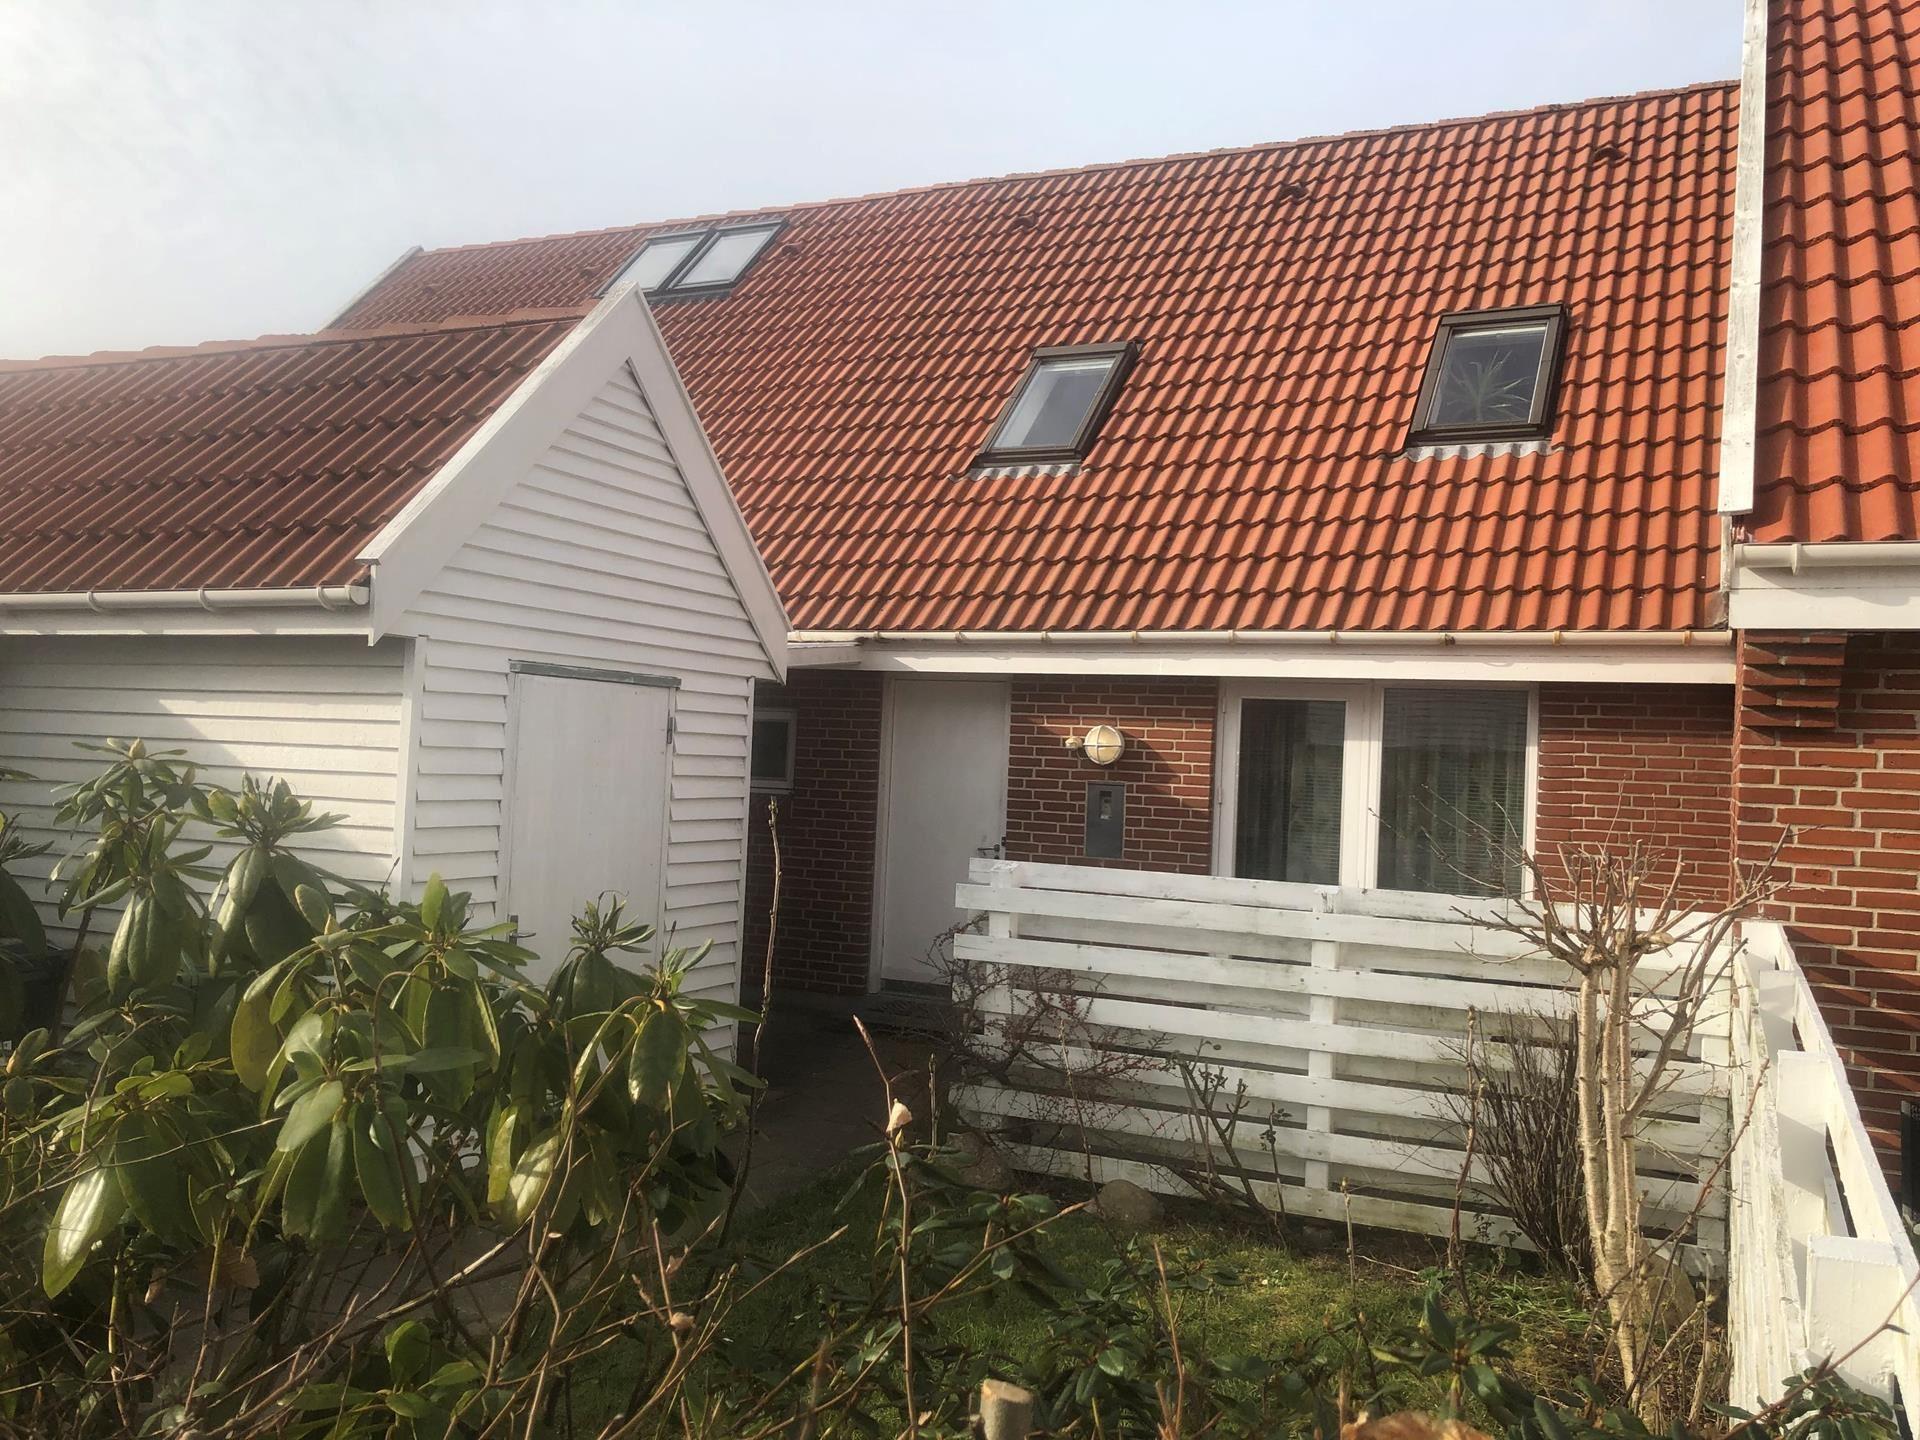 Solbærhaven 119, 8520 Lystrup